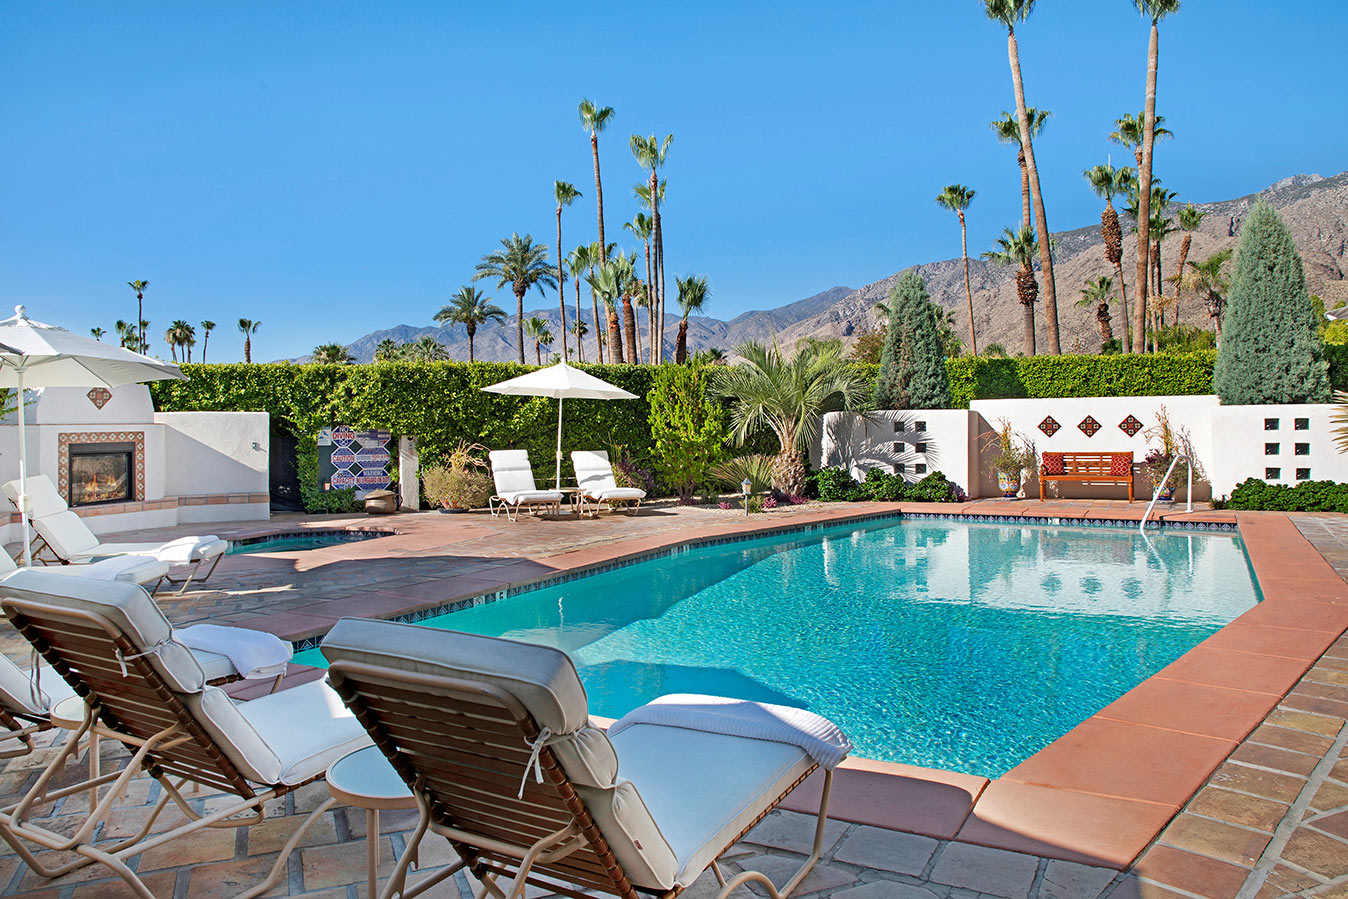 Pool deck view at The Hacienda in Gay Palm Springs